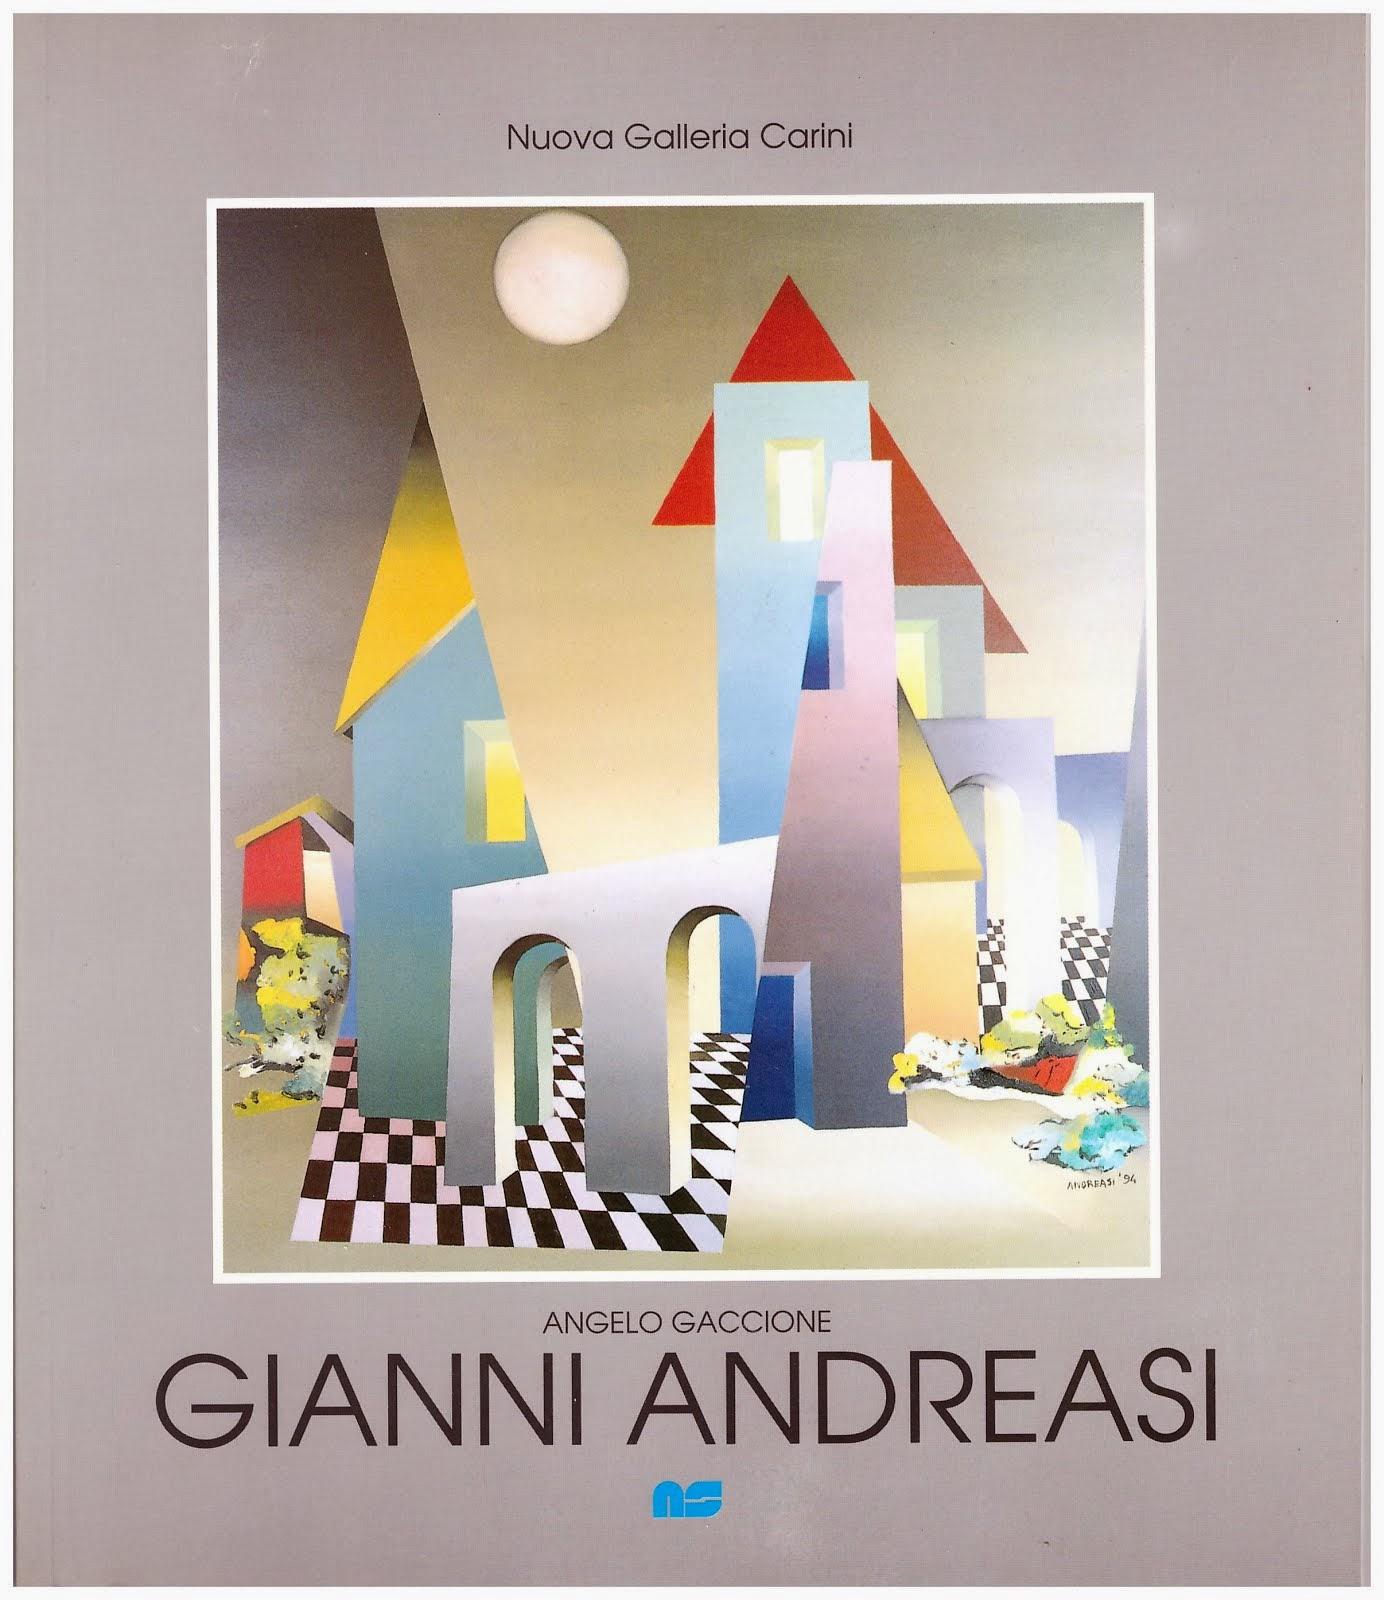 Gianni Andreasi 2